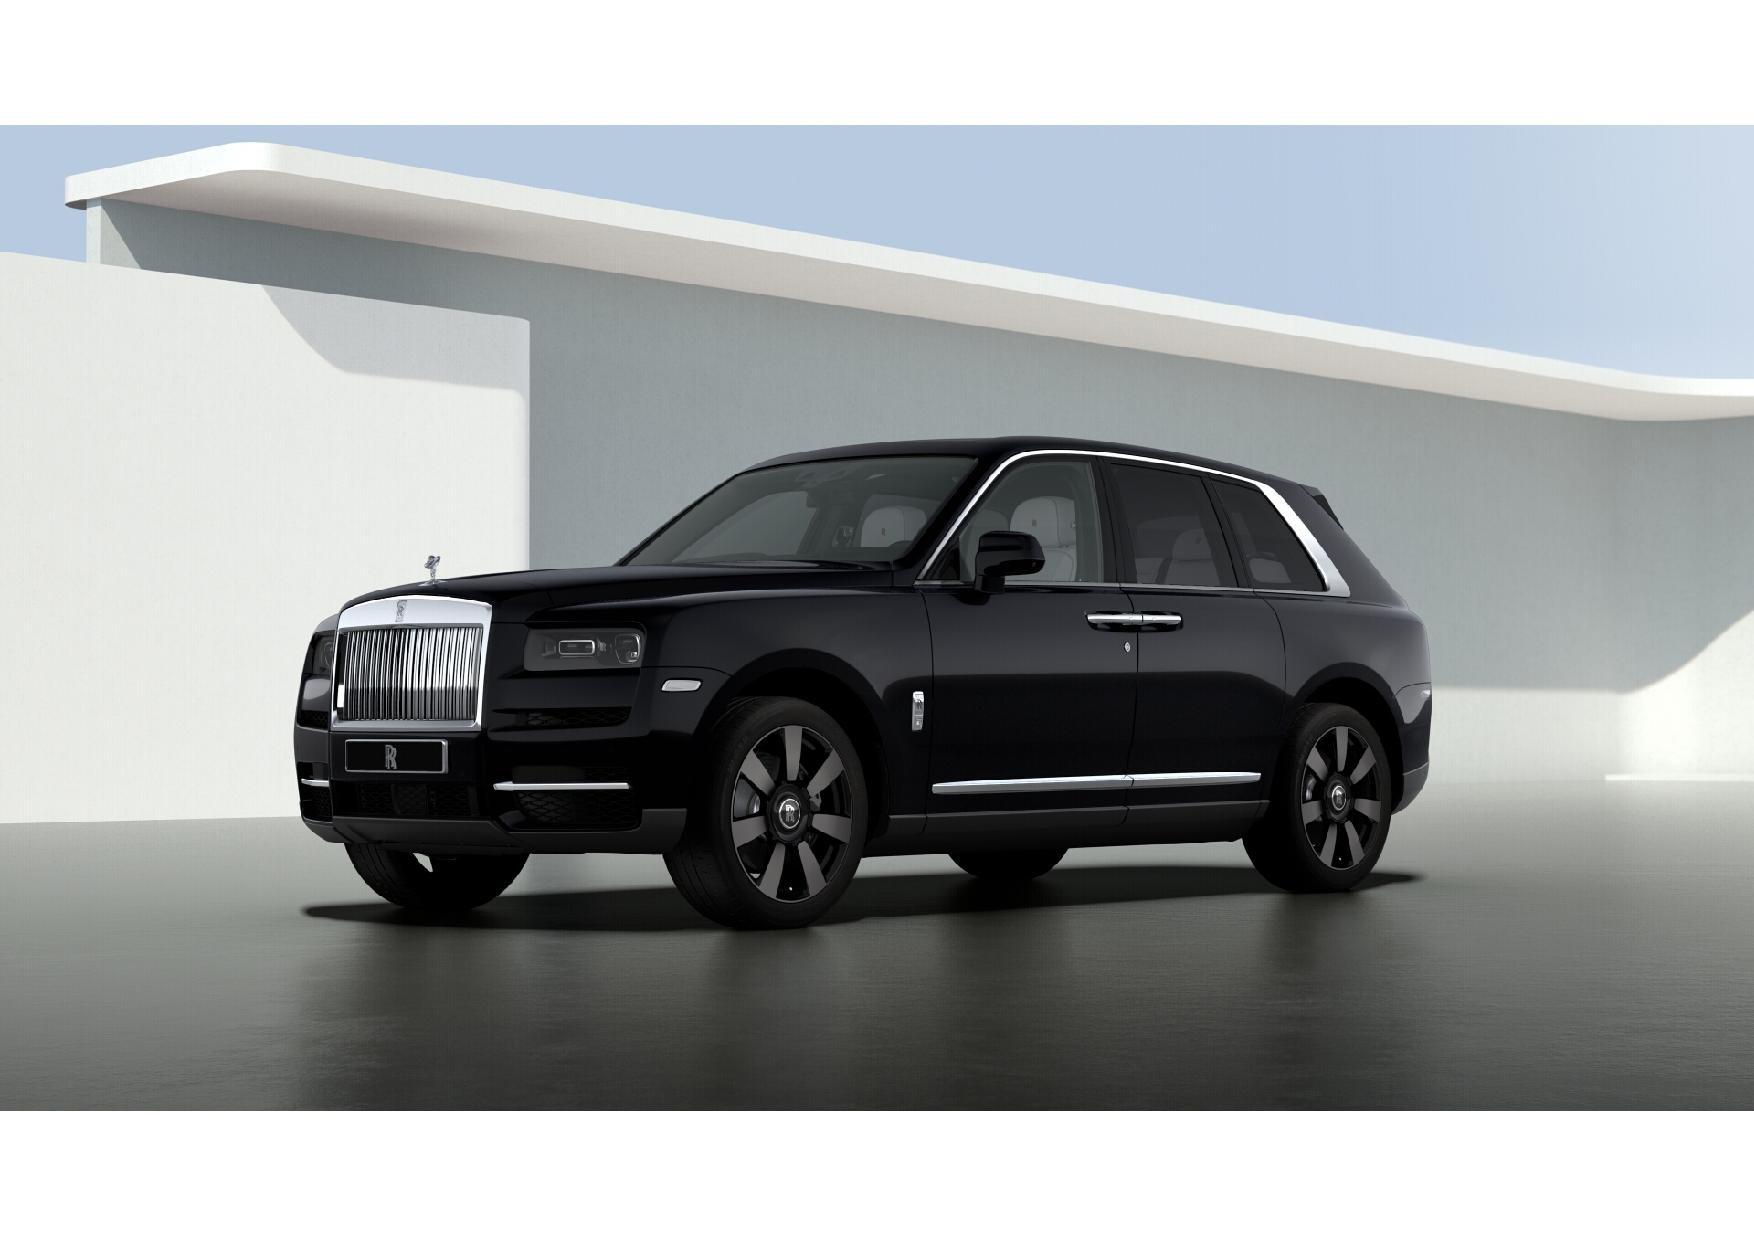 New 2021 Rolls-Royce Cullinan for sale $376,075 at McLaren Greenwich in Greenwich CT 06830 1